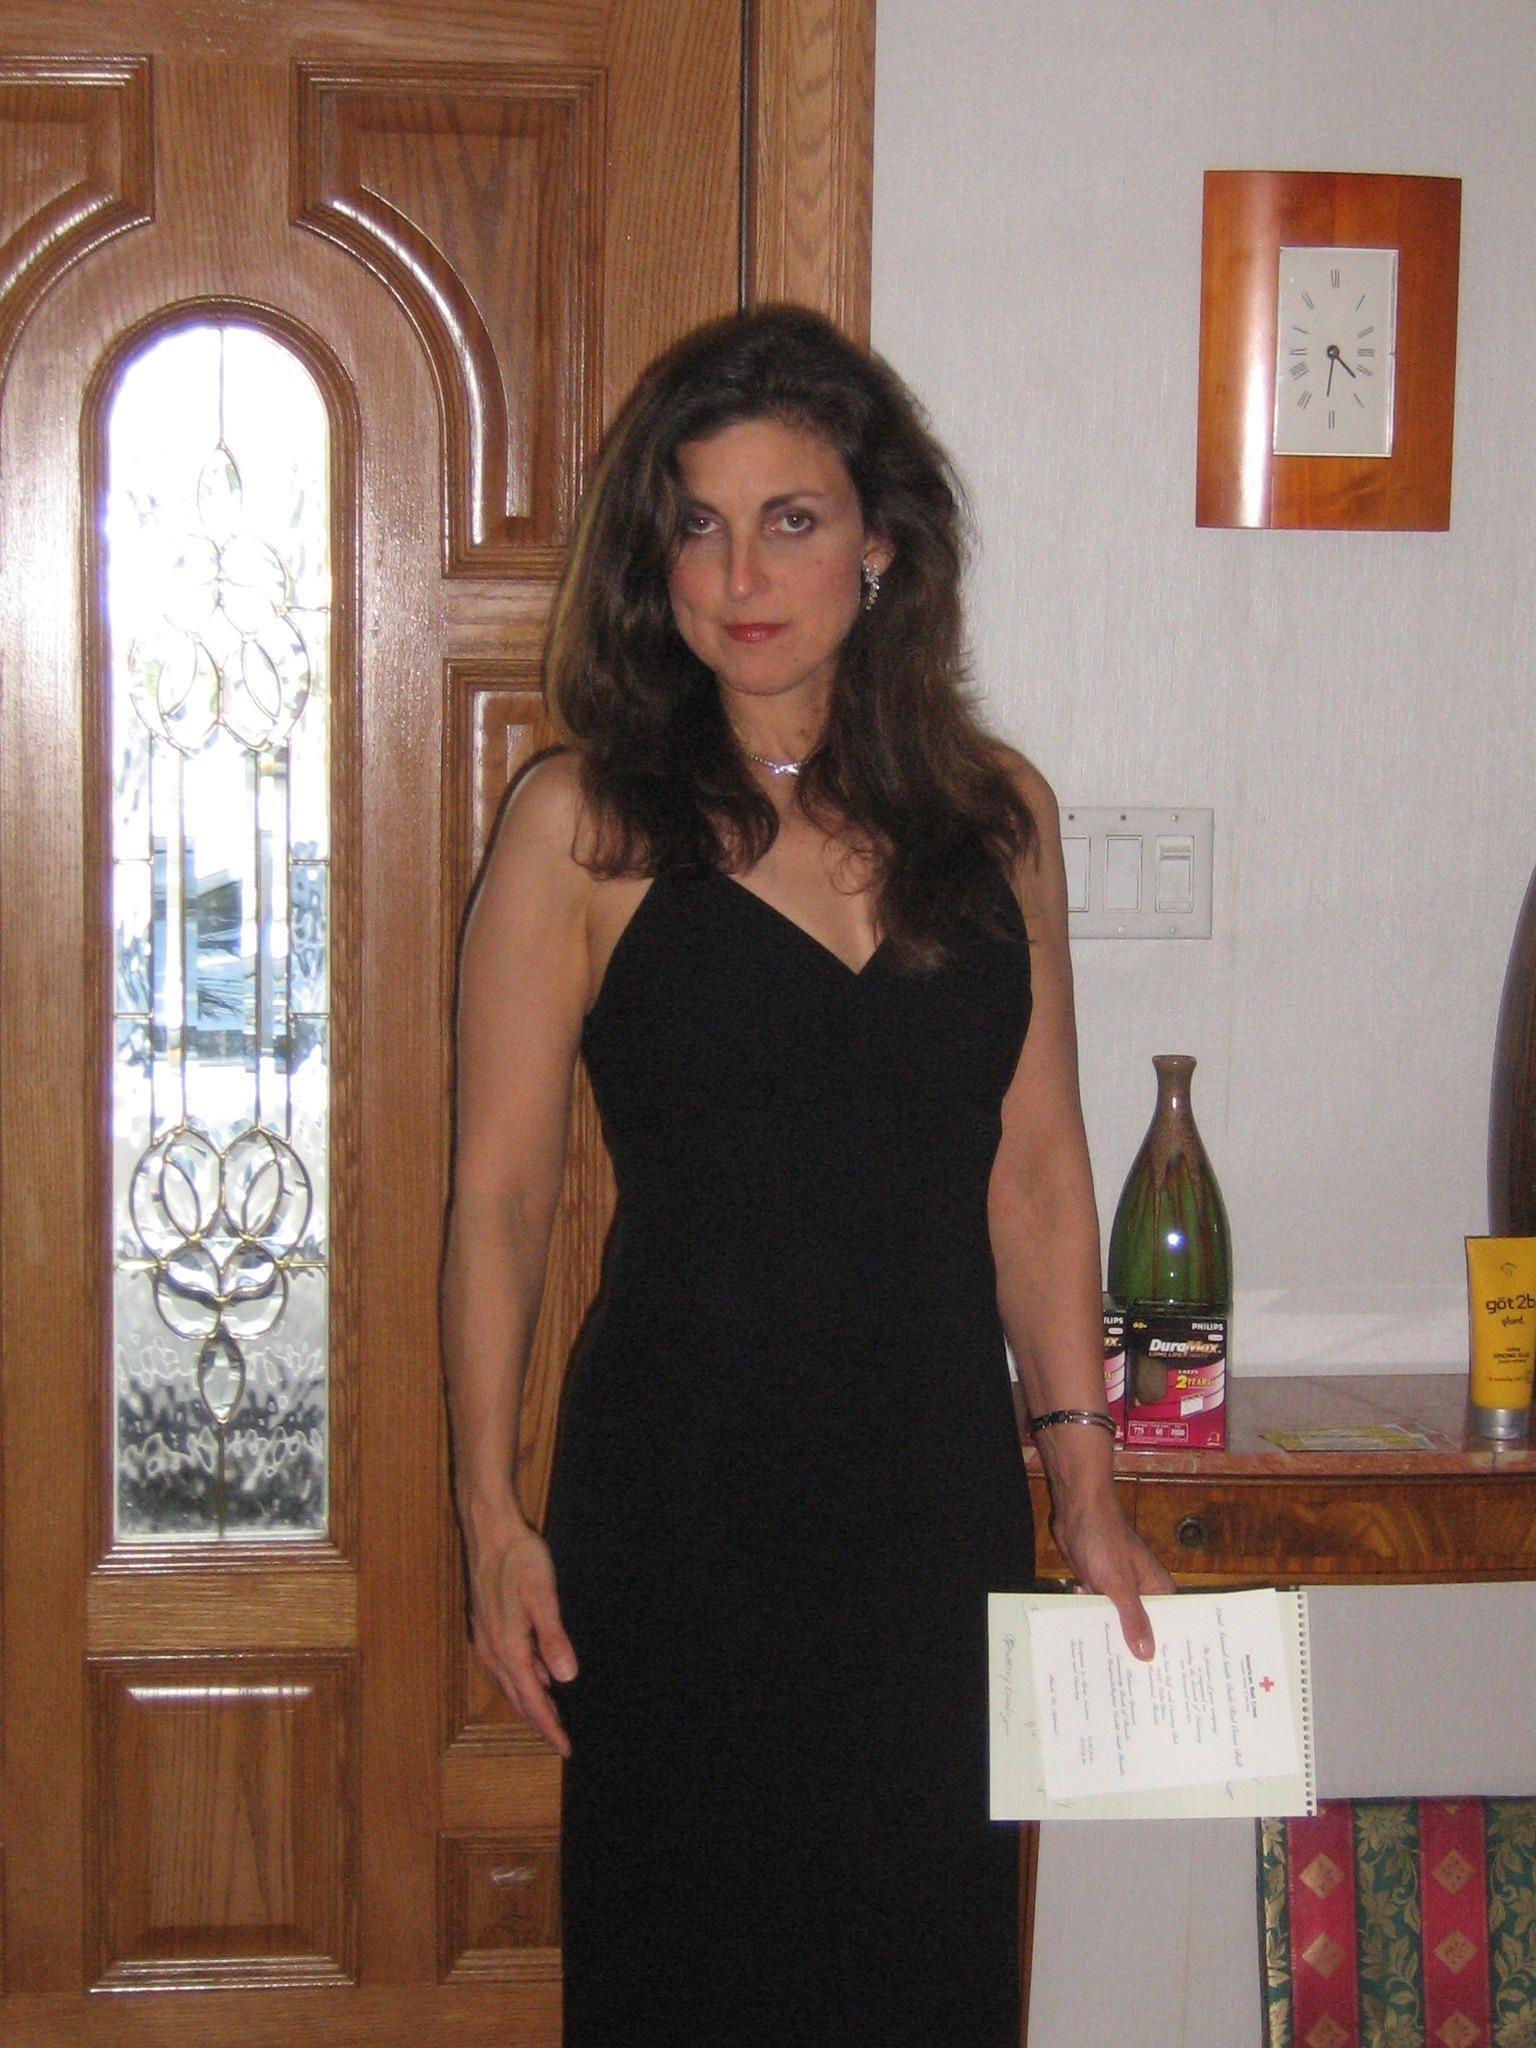 beste plek om hook up in Fort Lauderdale online dating websites Londen